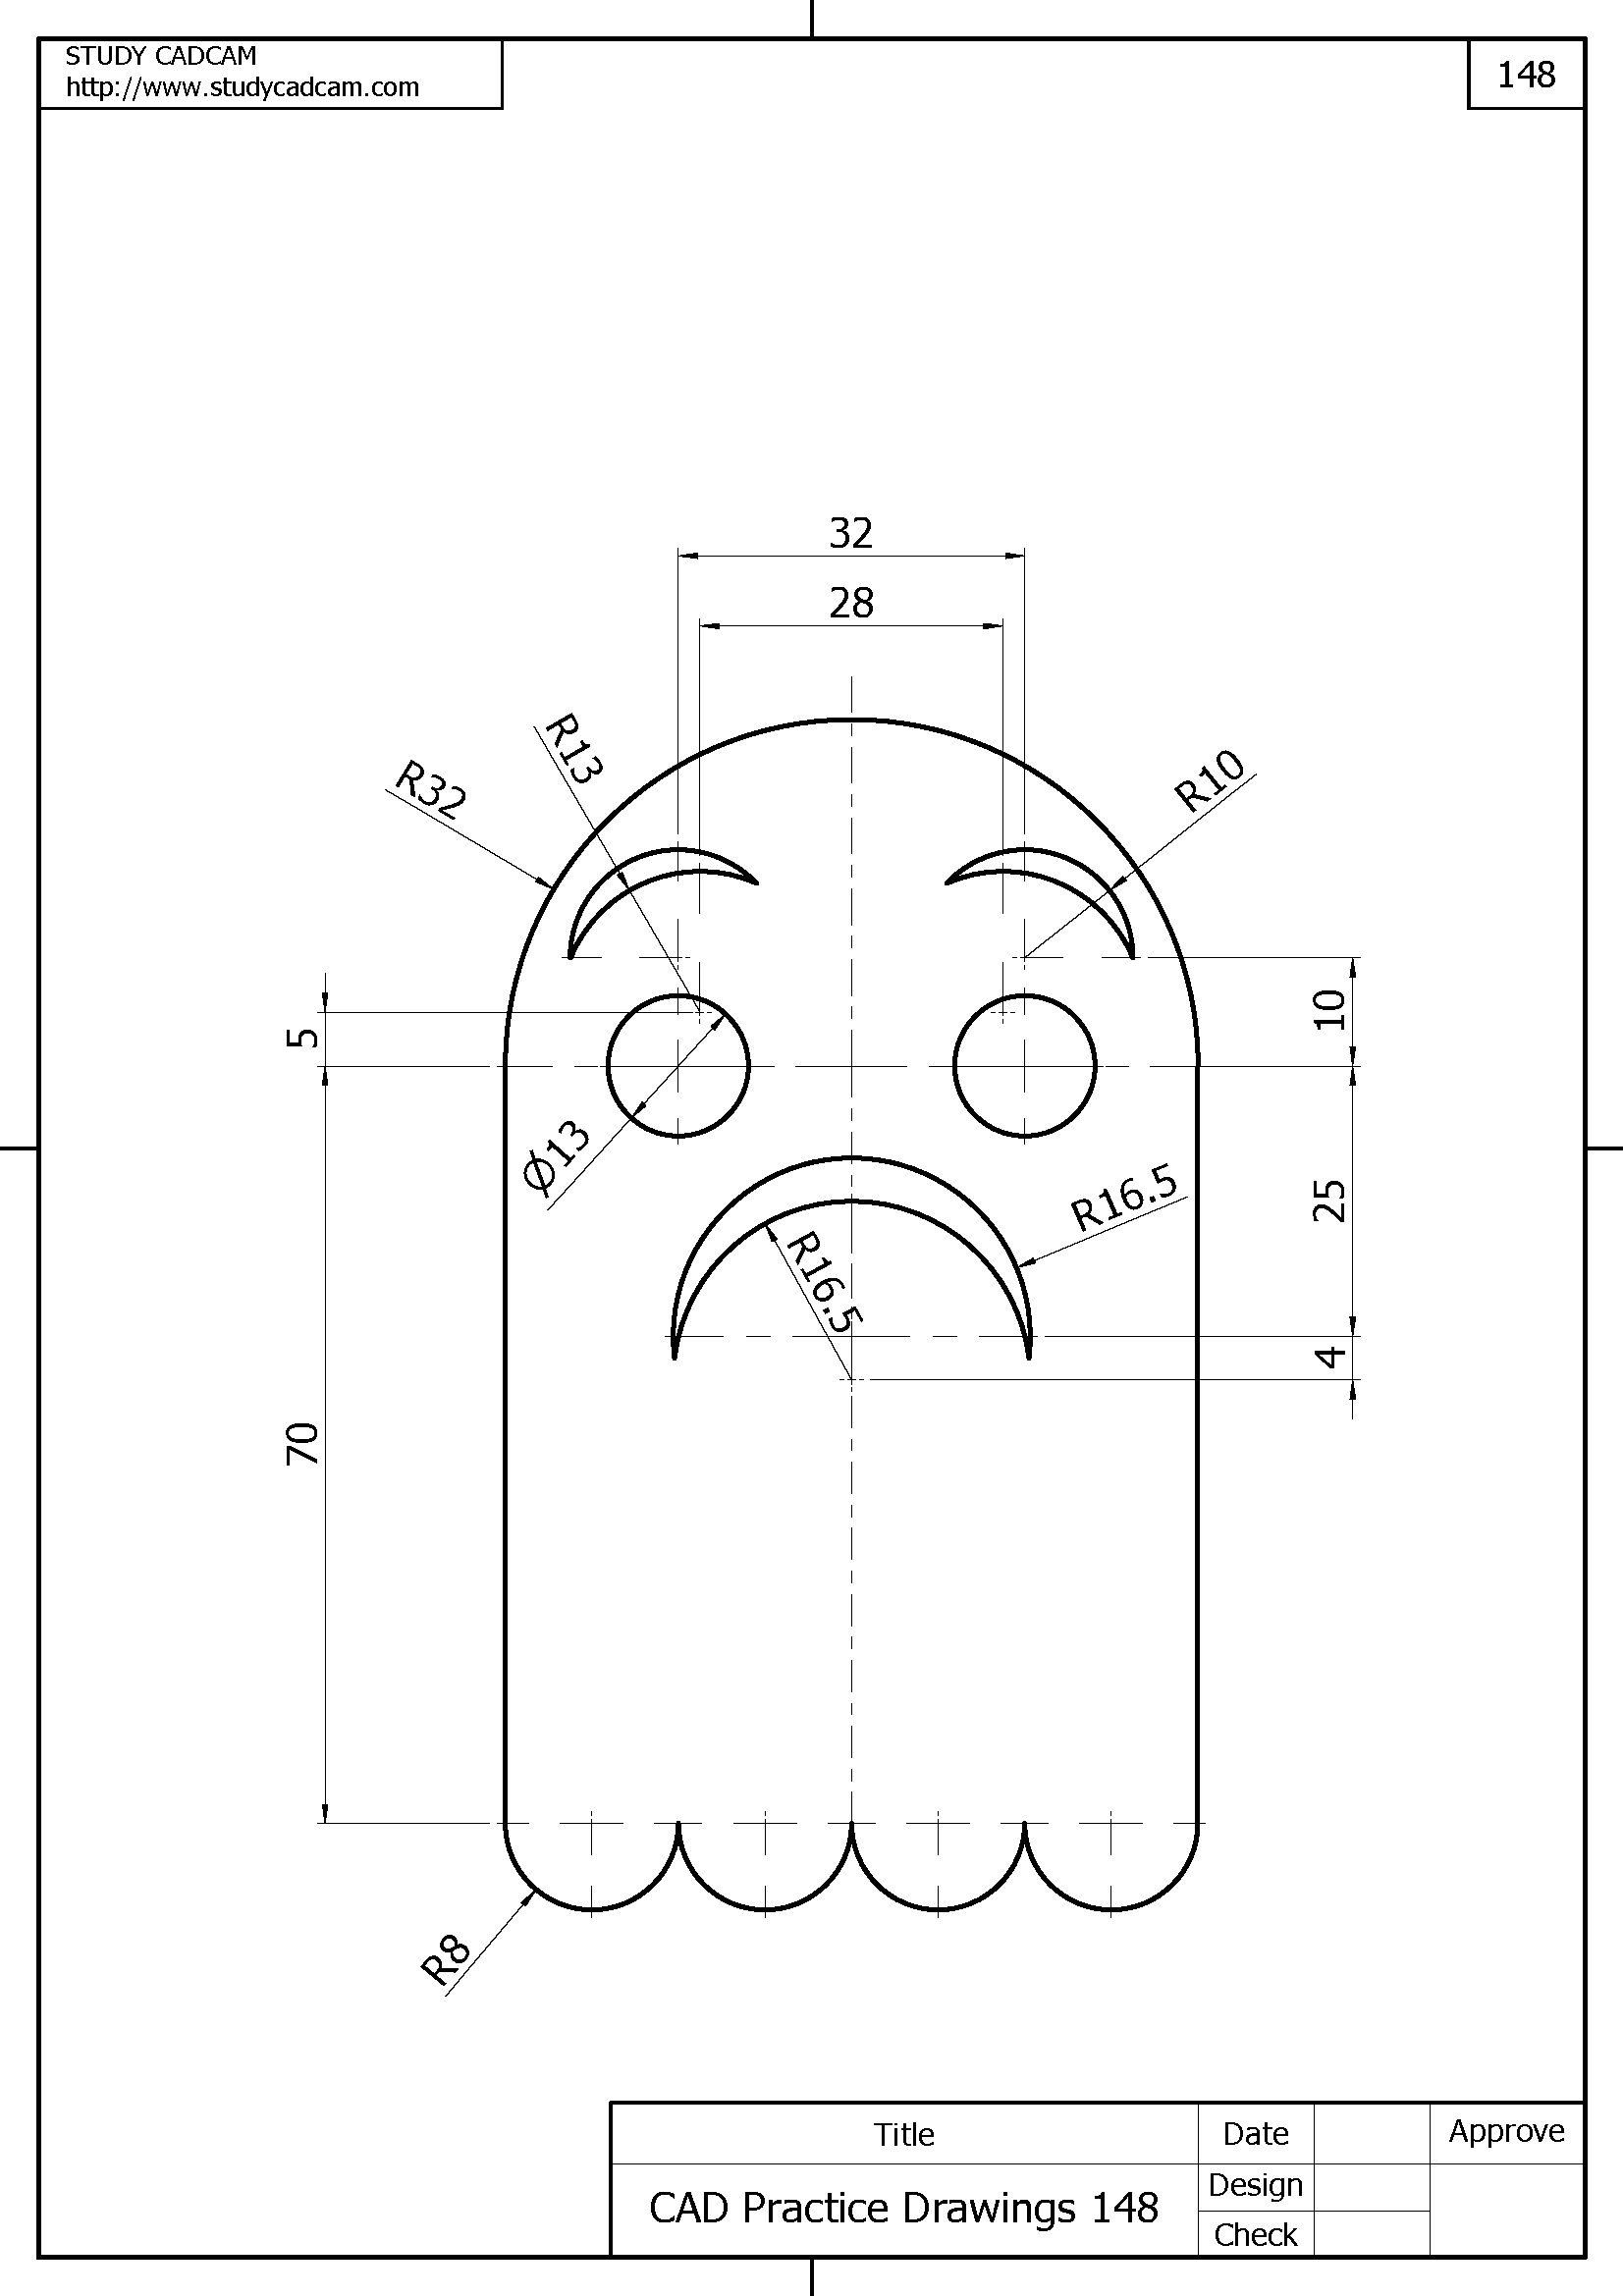 Cad Practice Drawings Studycadcam